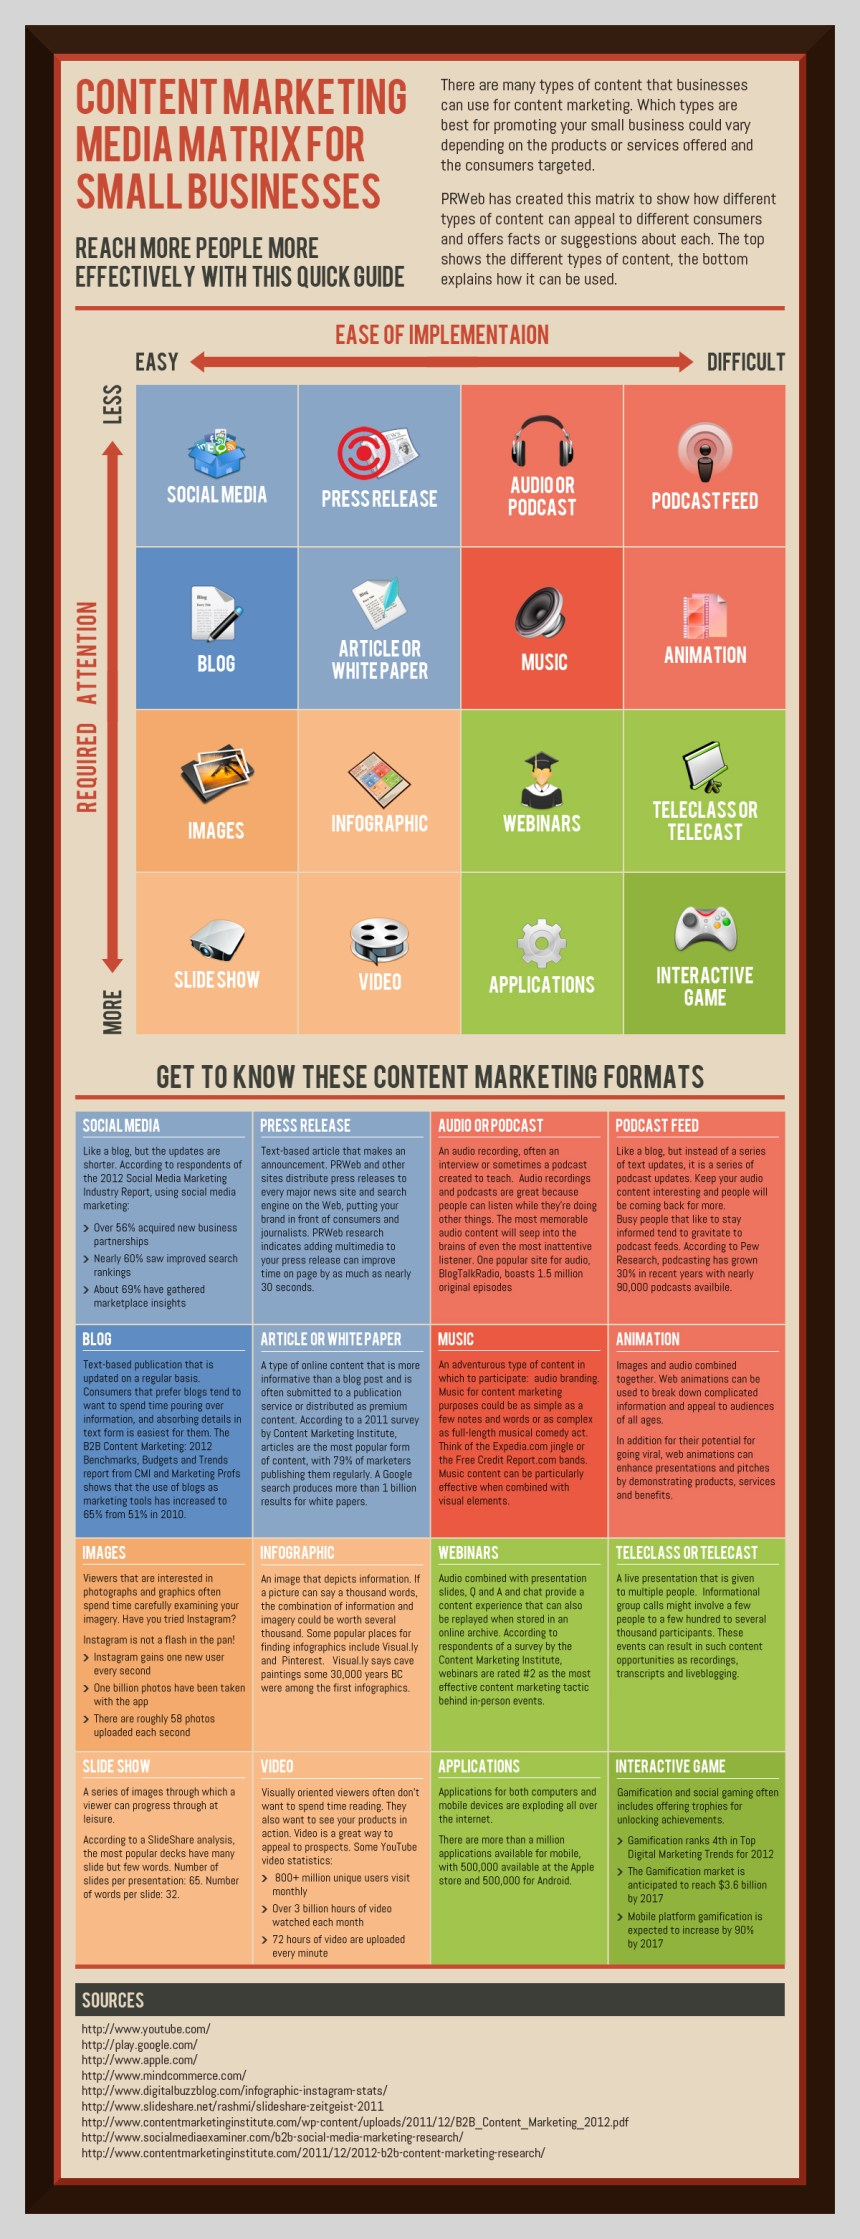 Matriz de marketing de contenidos para pymes